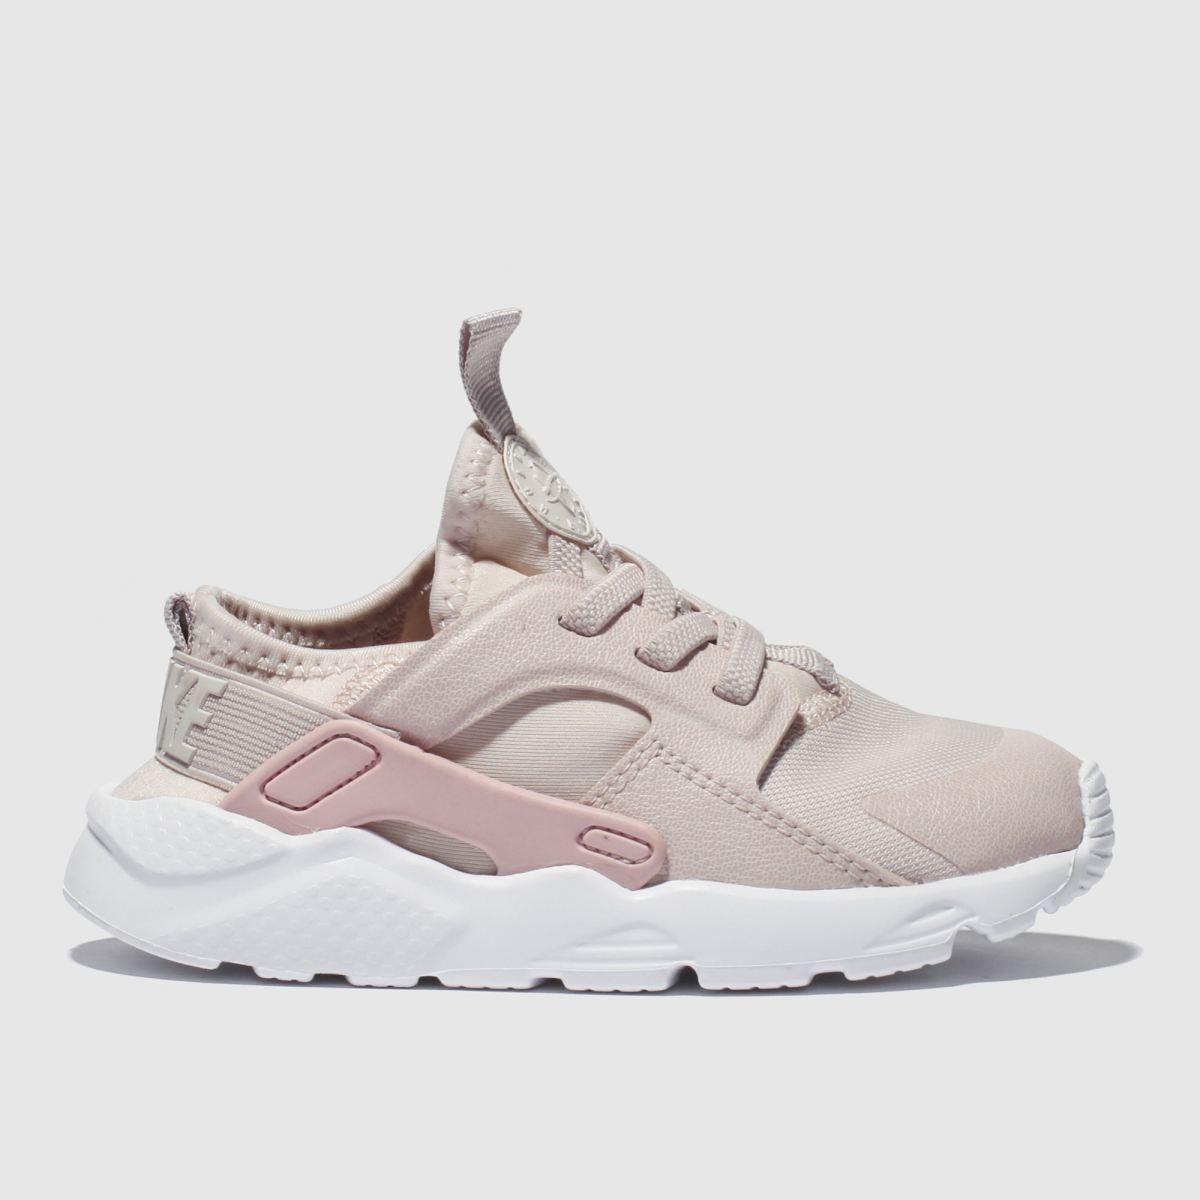 Nike Pale Pink Huarache Run Ultra Premium Trainers Toddler